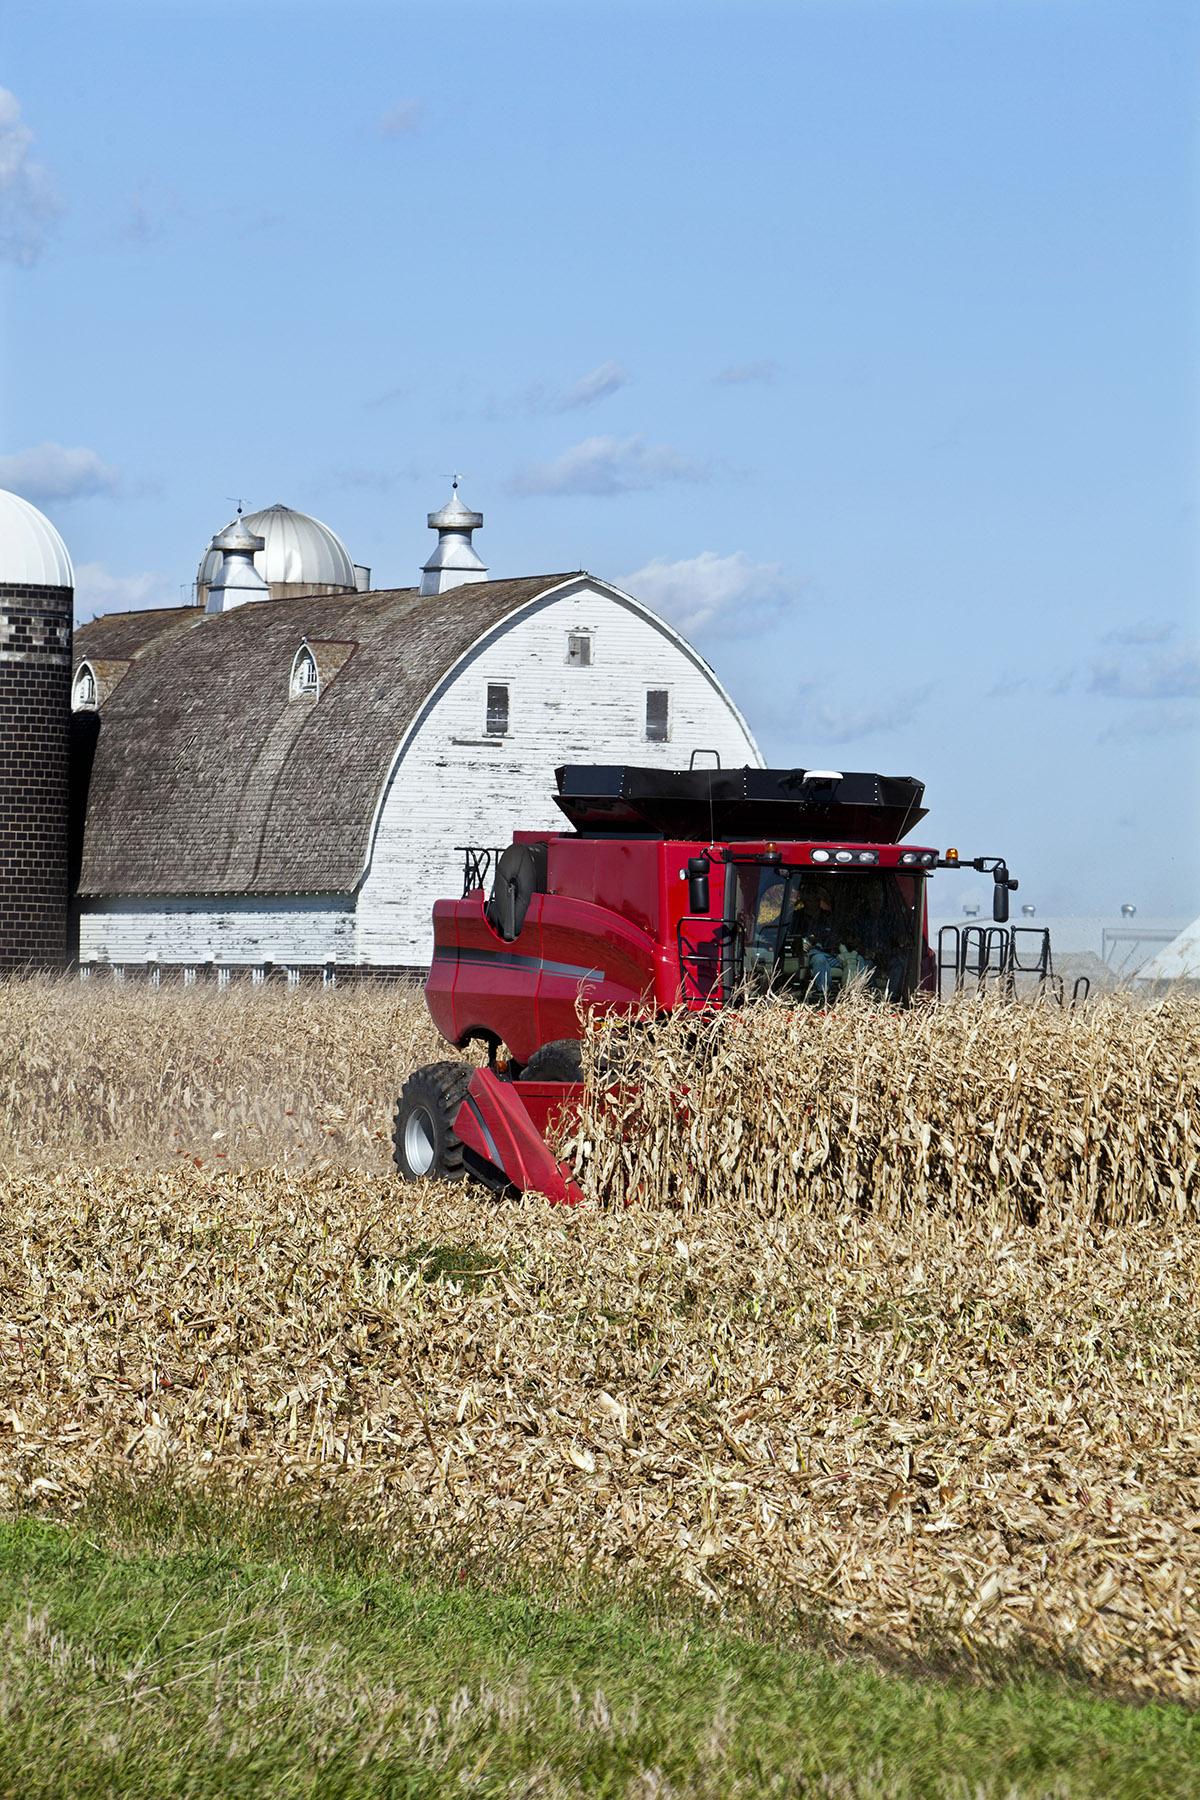 Our Mission | U.S. Based Food Commodities Exports | Agri International LLC